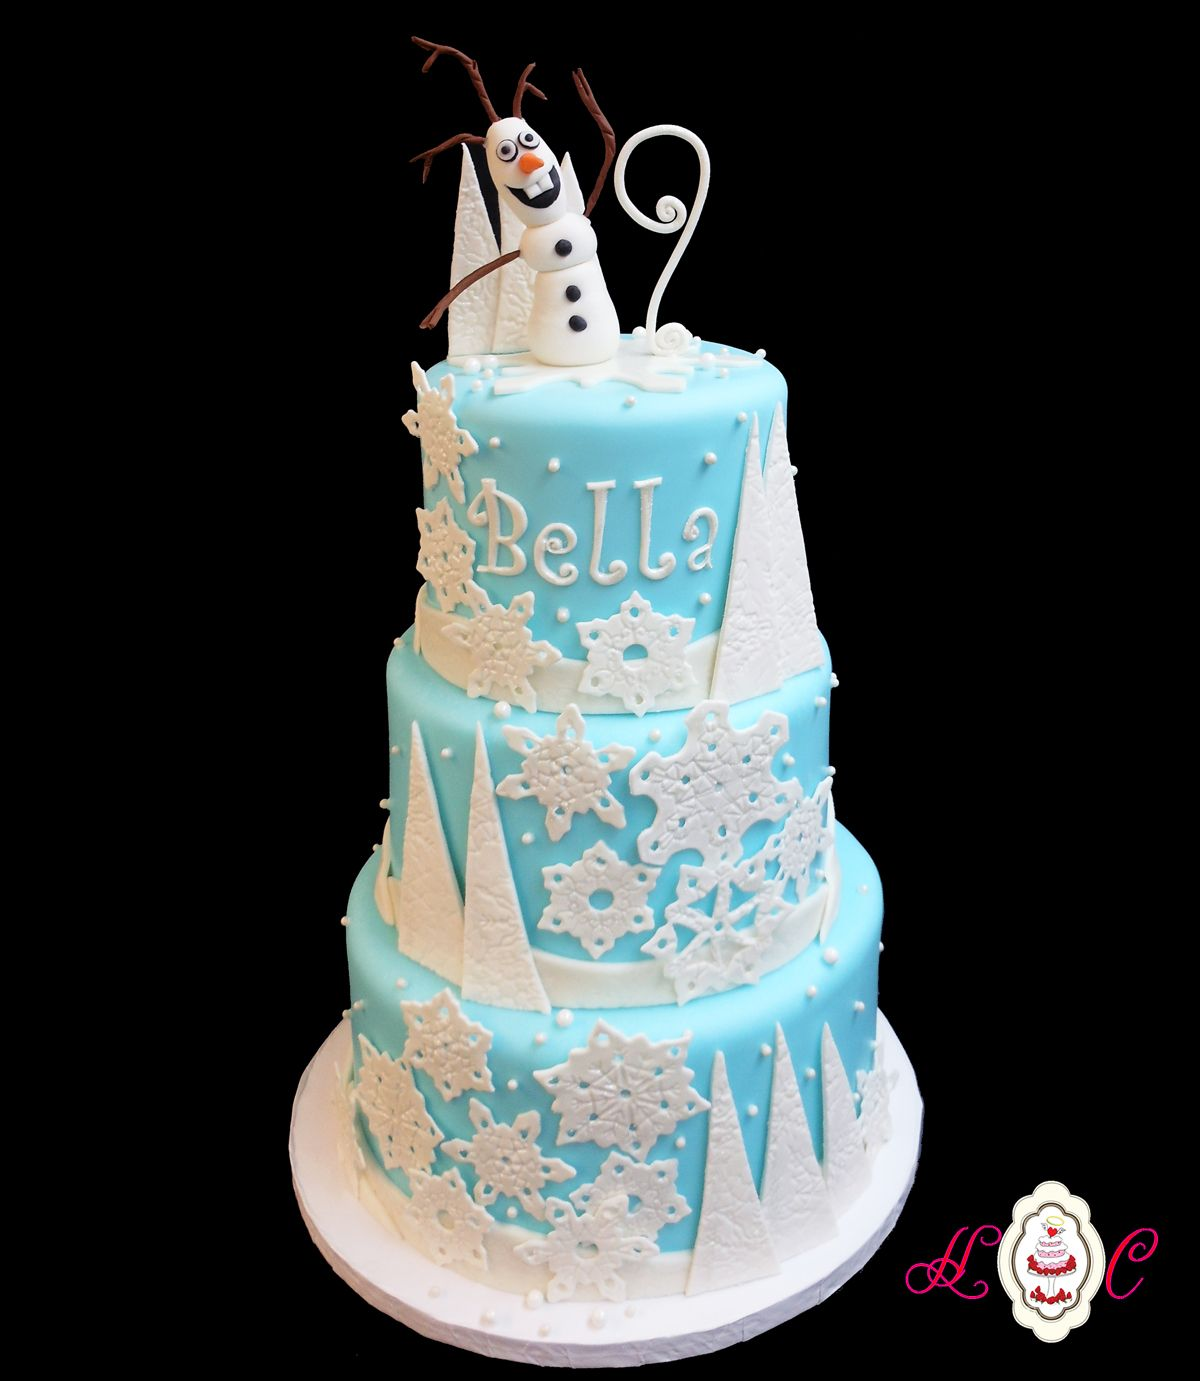 Terrific Olaf Birthday Cake Disneys Frozen Olaf Birthday 3 Tier Cake By Birthday Cards Printable Inklcafe Filternl